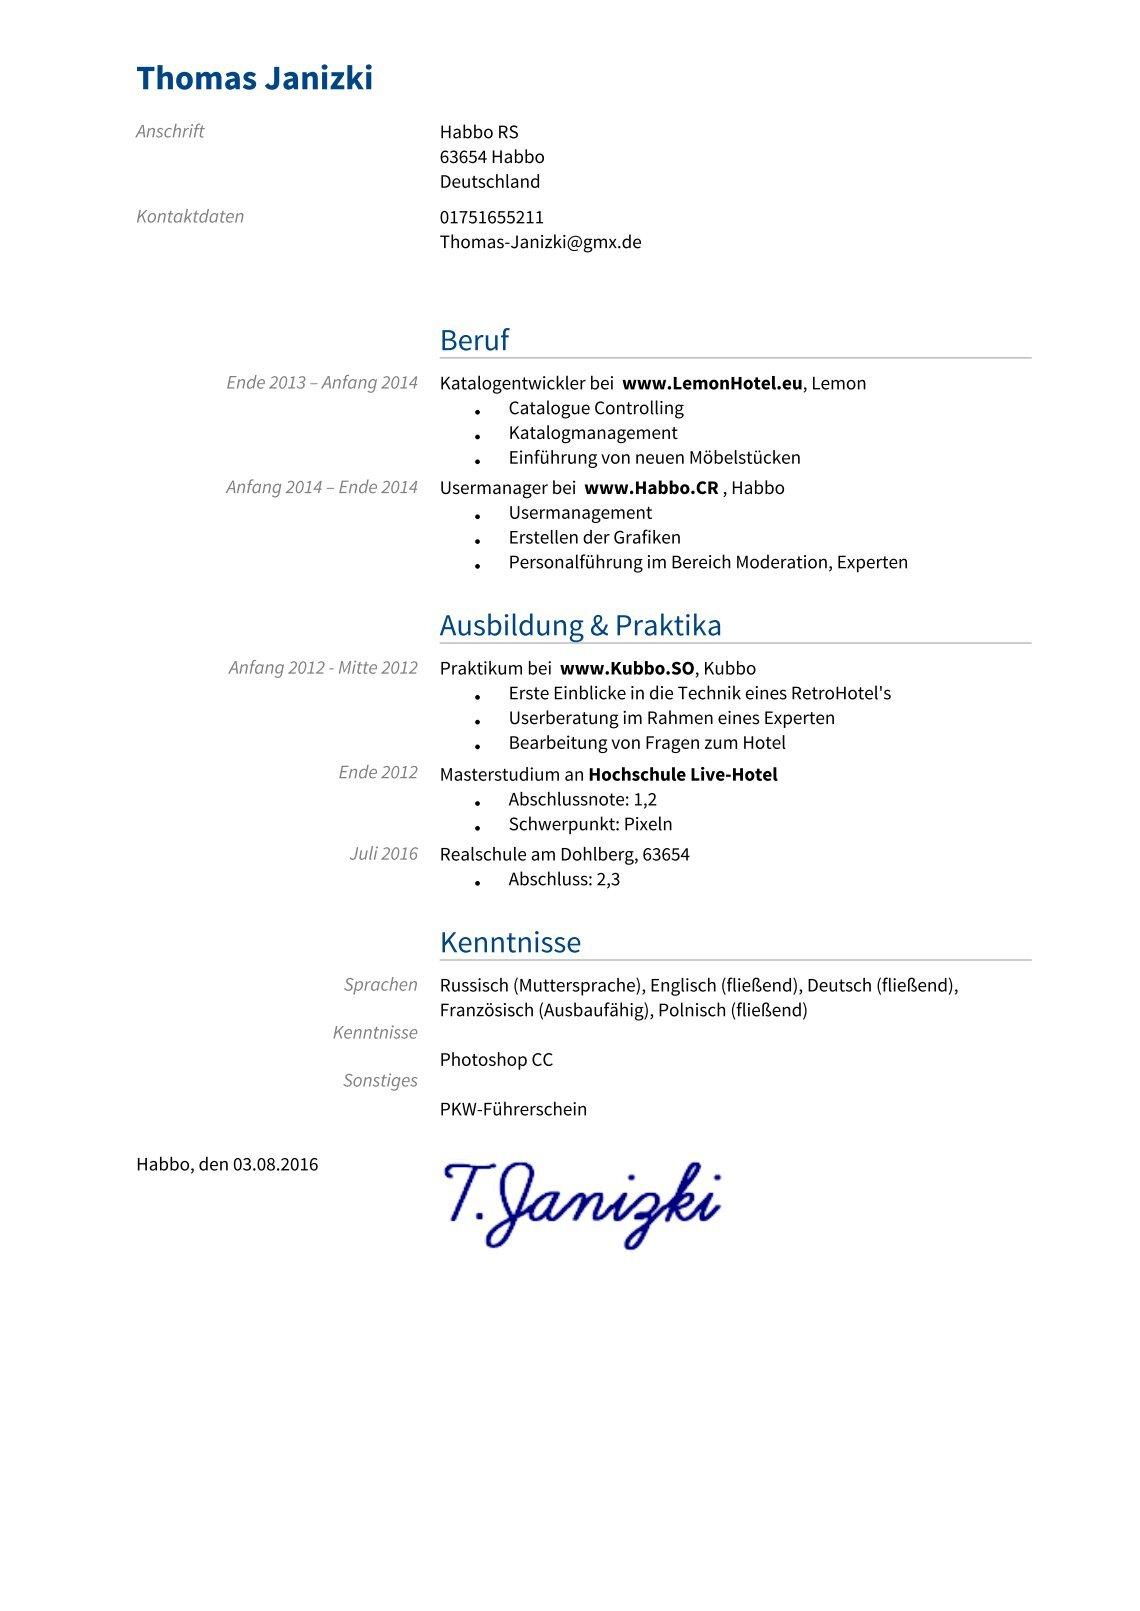 Wunderbar Hotel Technik Lebenslauf Ideen - FORTSETZUNG ARBEITSBLATT ...